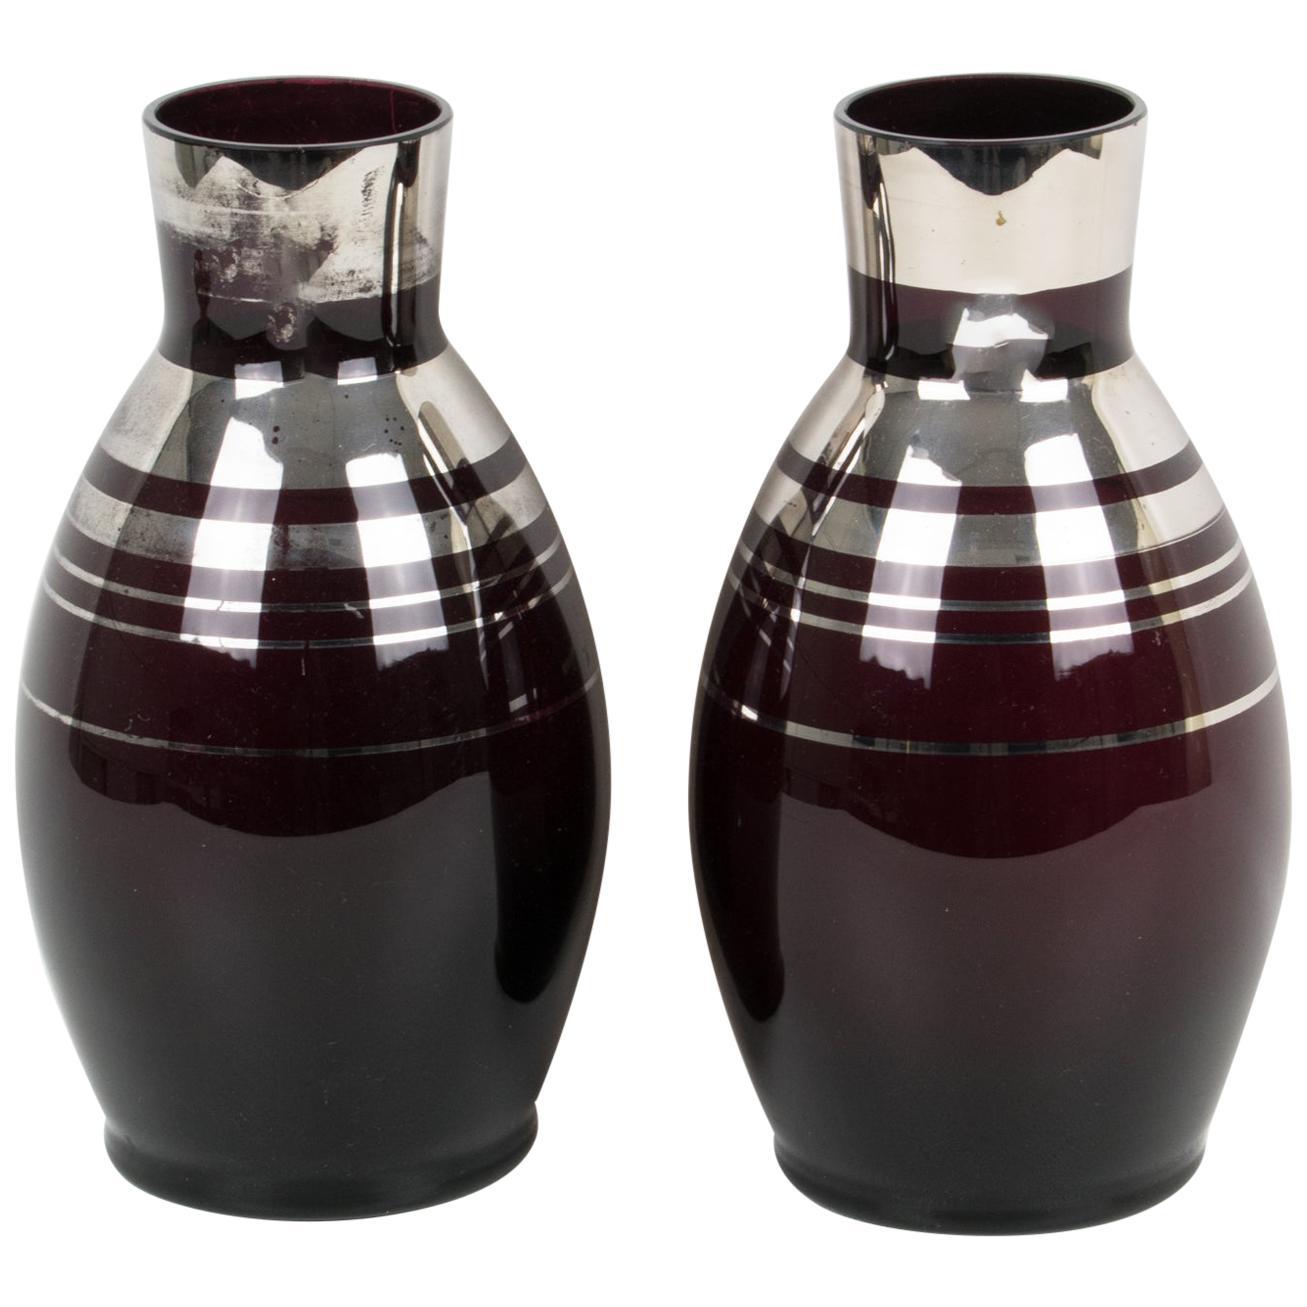 Art Deco 1930s Silver Overlay Black Glass Vase by Fains, a pair